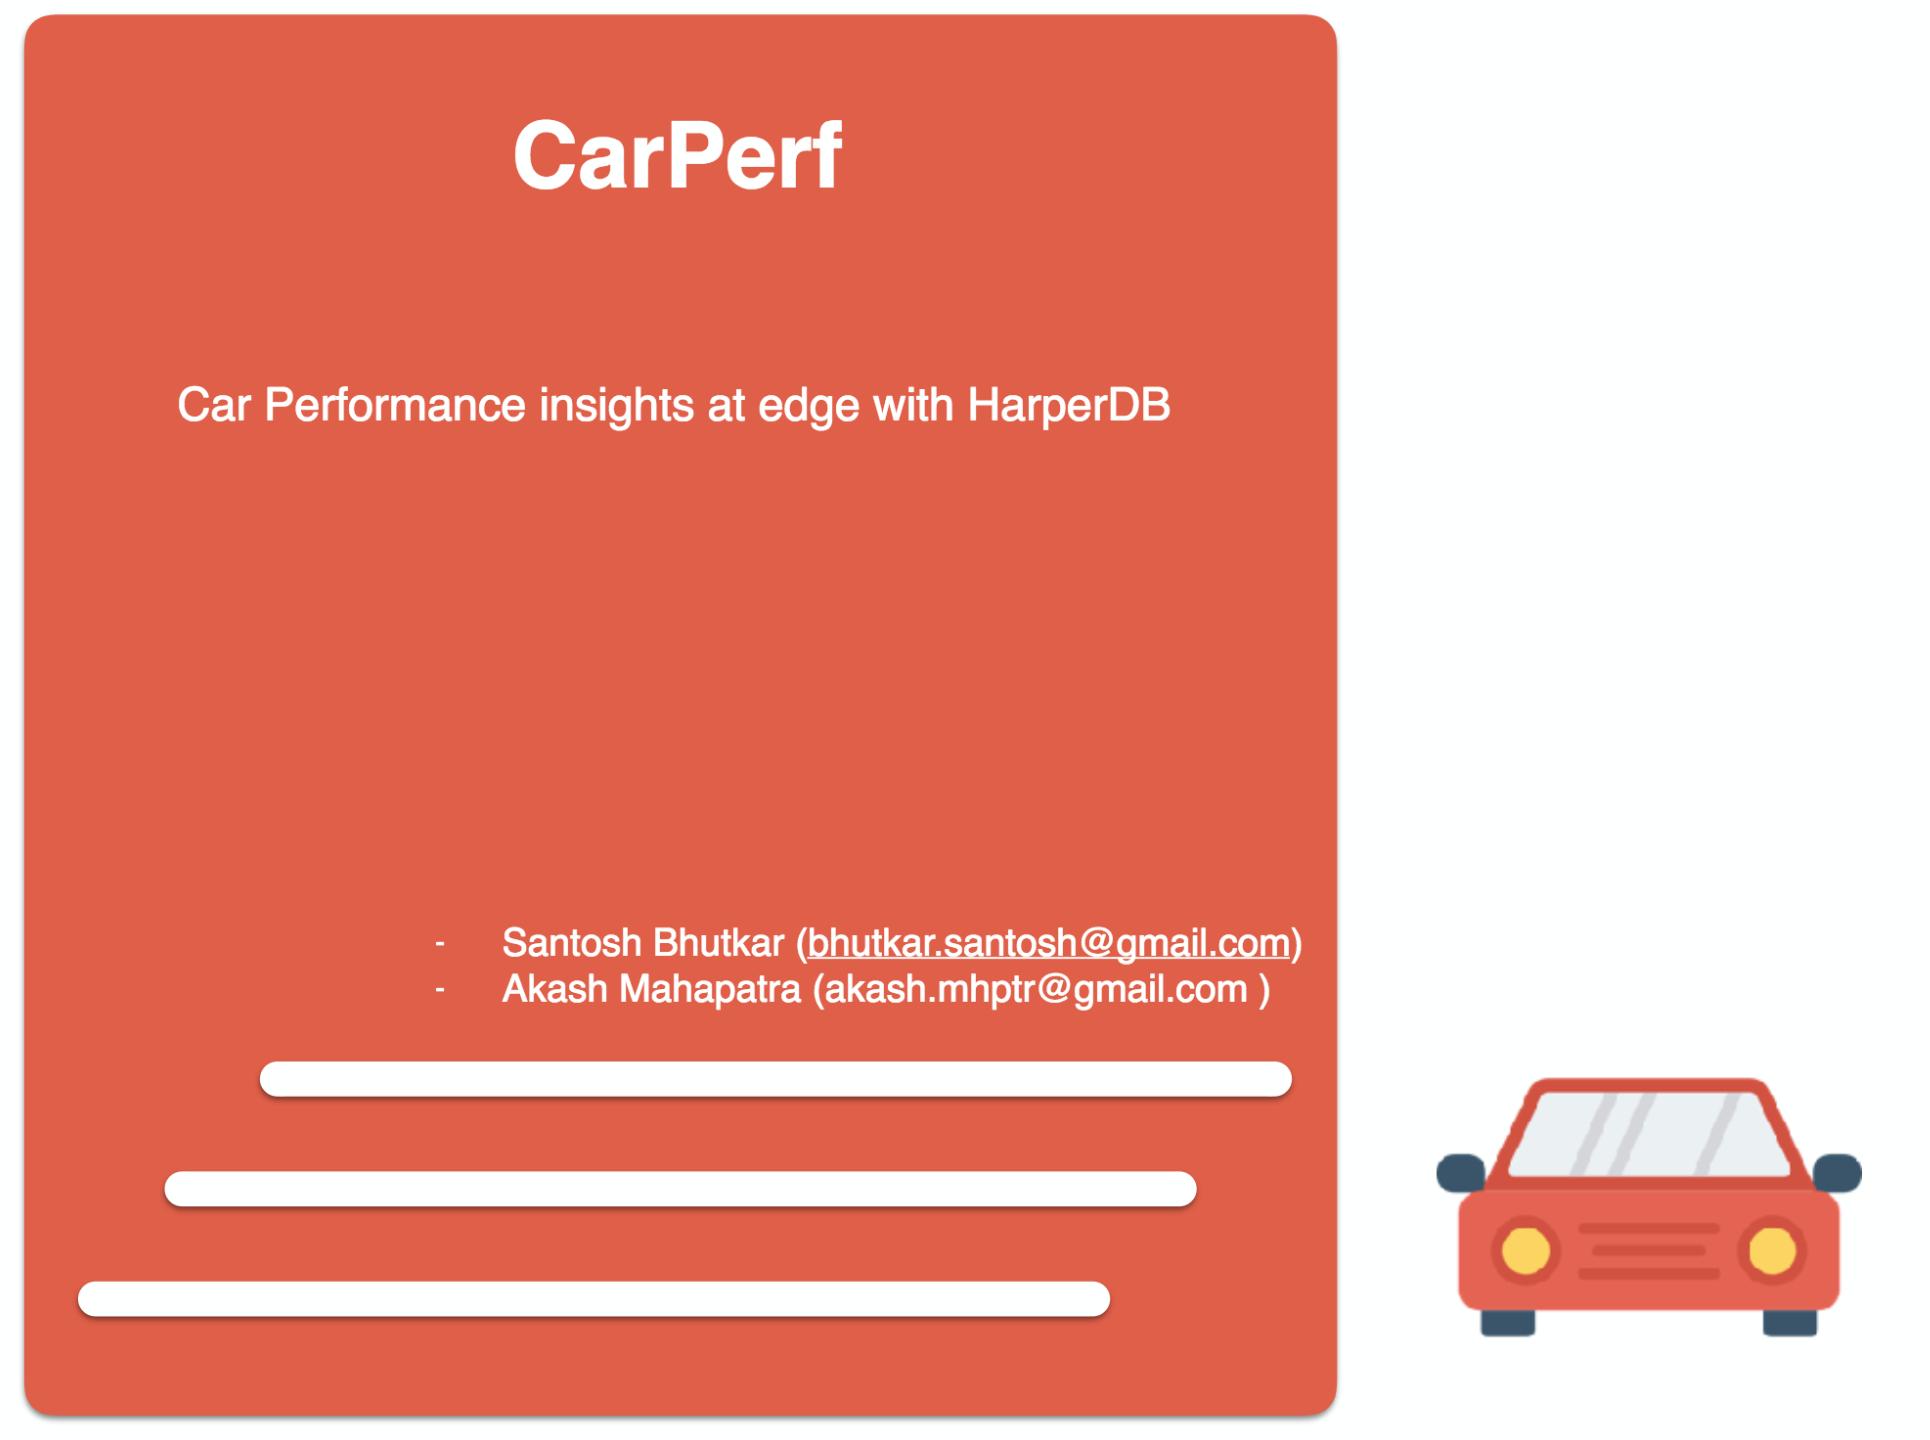 HarperDBHackathon_CarPerformance_pdf_at_master_·_santosh1208_HarperDBHackathon.png